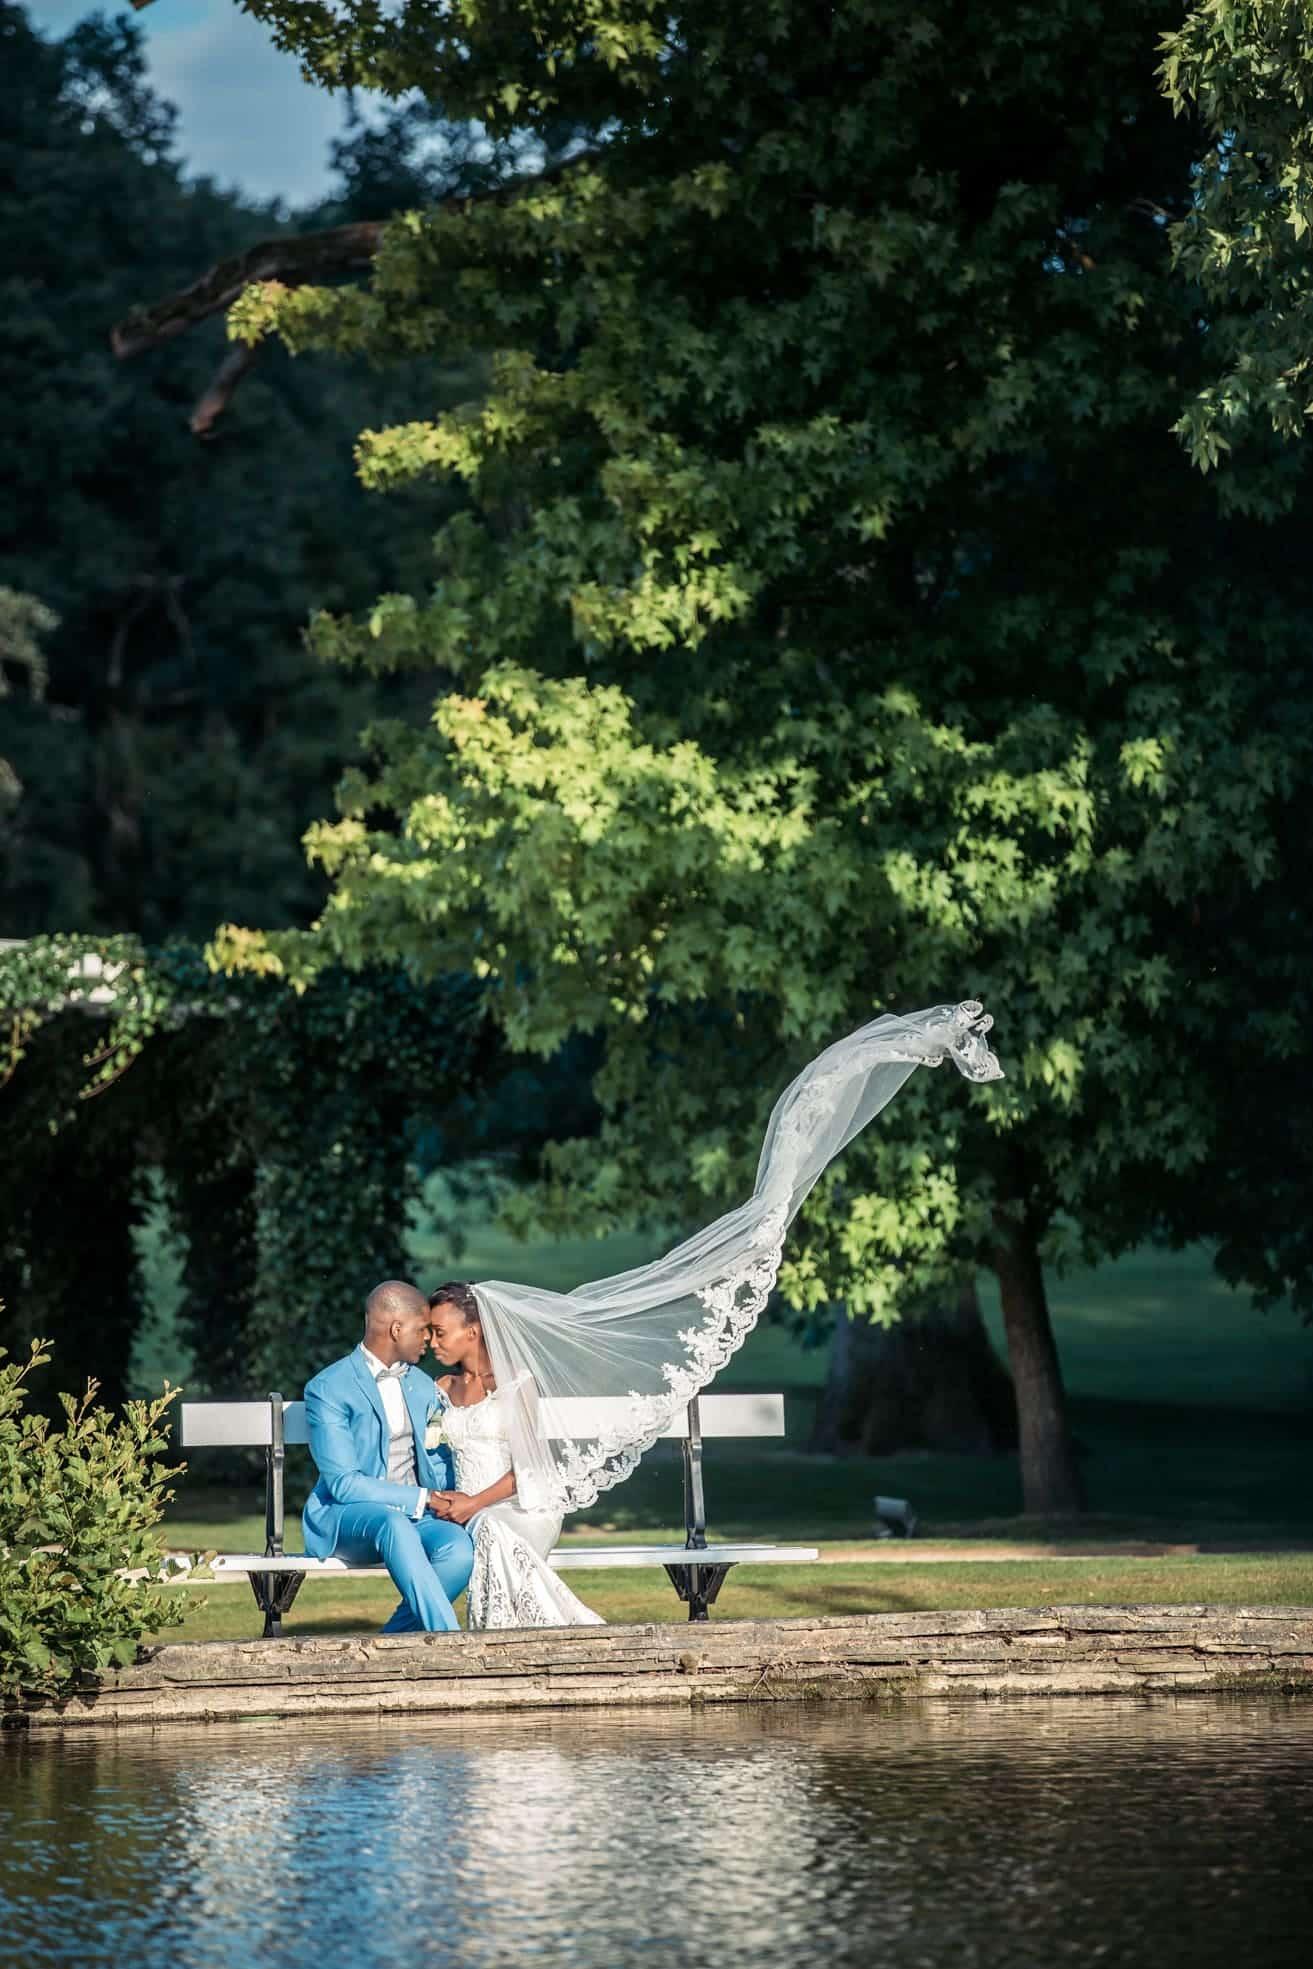 photographe mariage versailles, jean-Baptiste Chauvin, www.studioart-photographe.fr, photographe émotions, photographe mariage paris